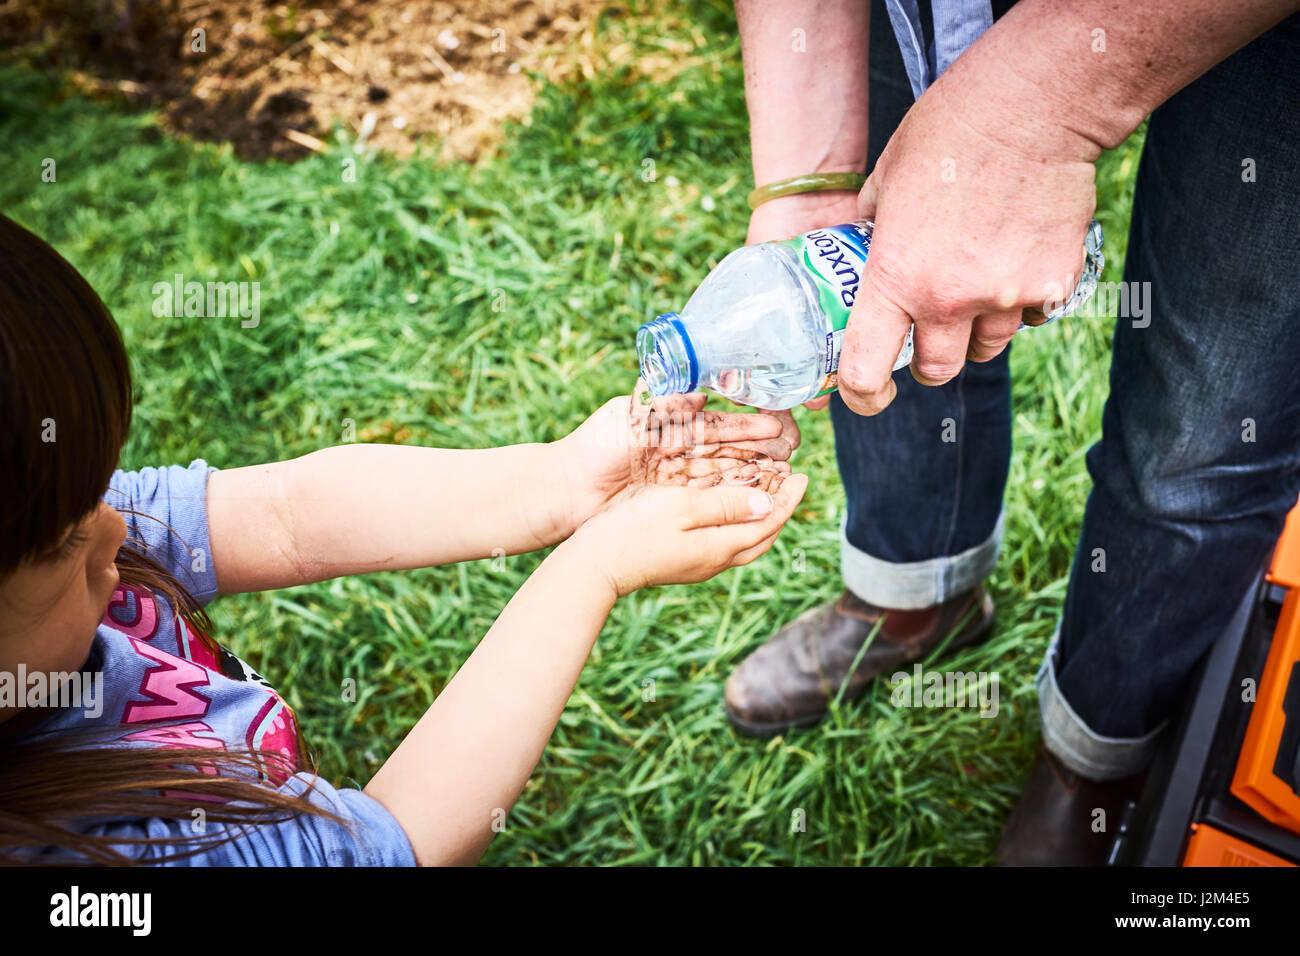 Year Old Child Washing Hands Stock Photos & Year Old Child Washing ...